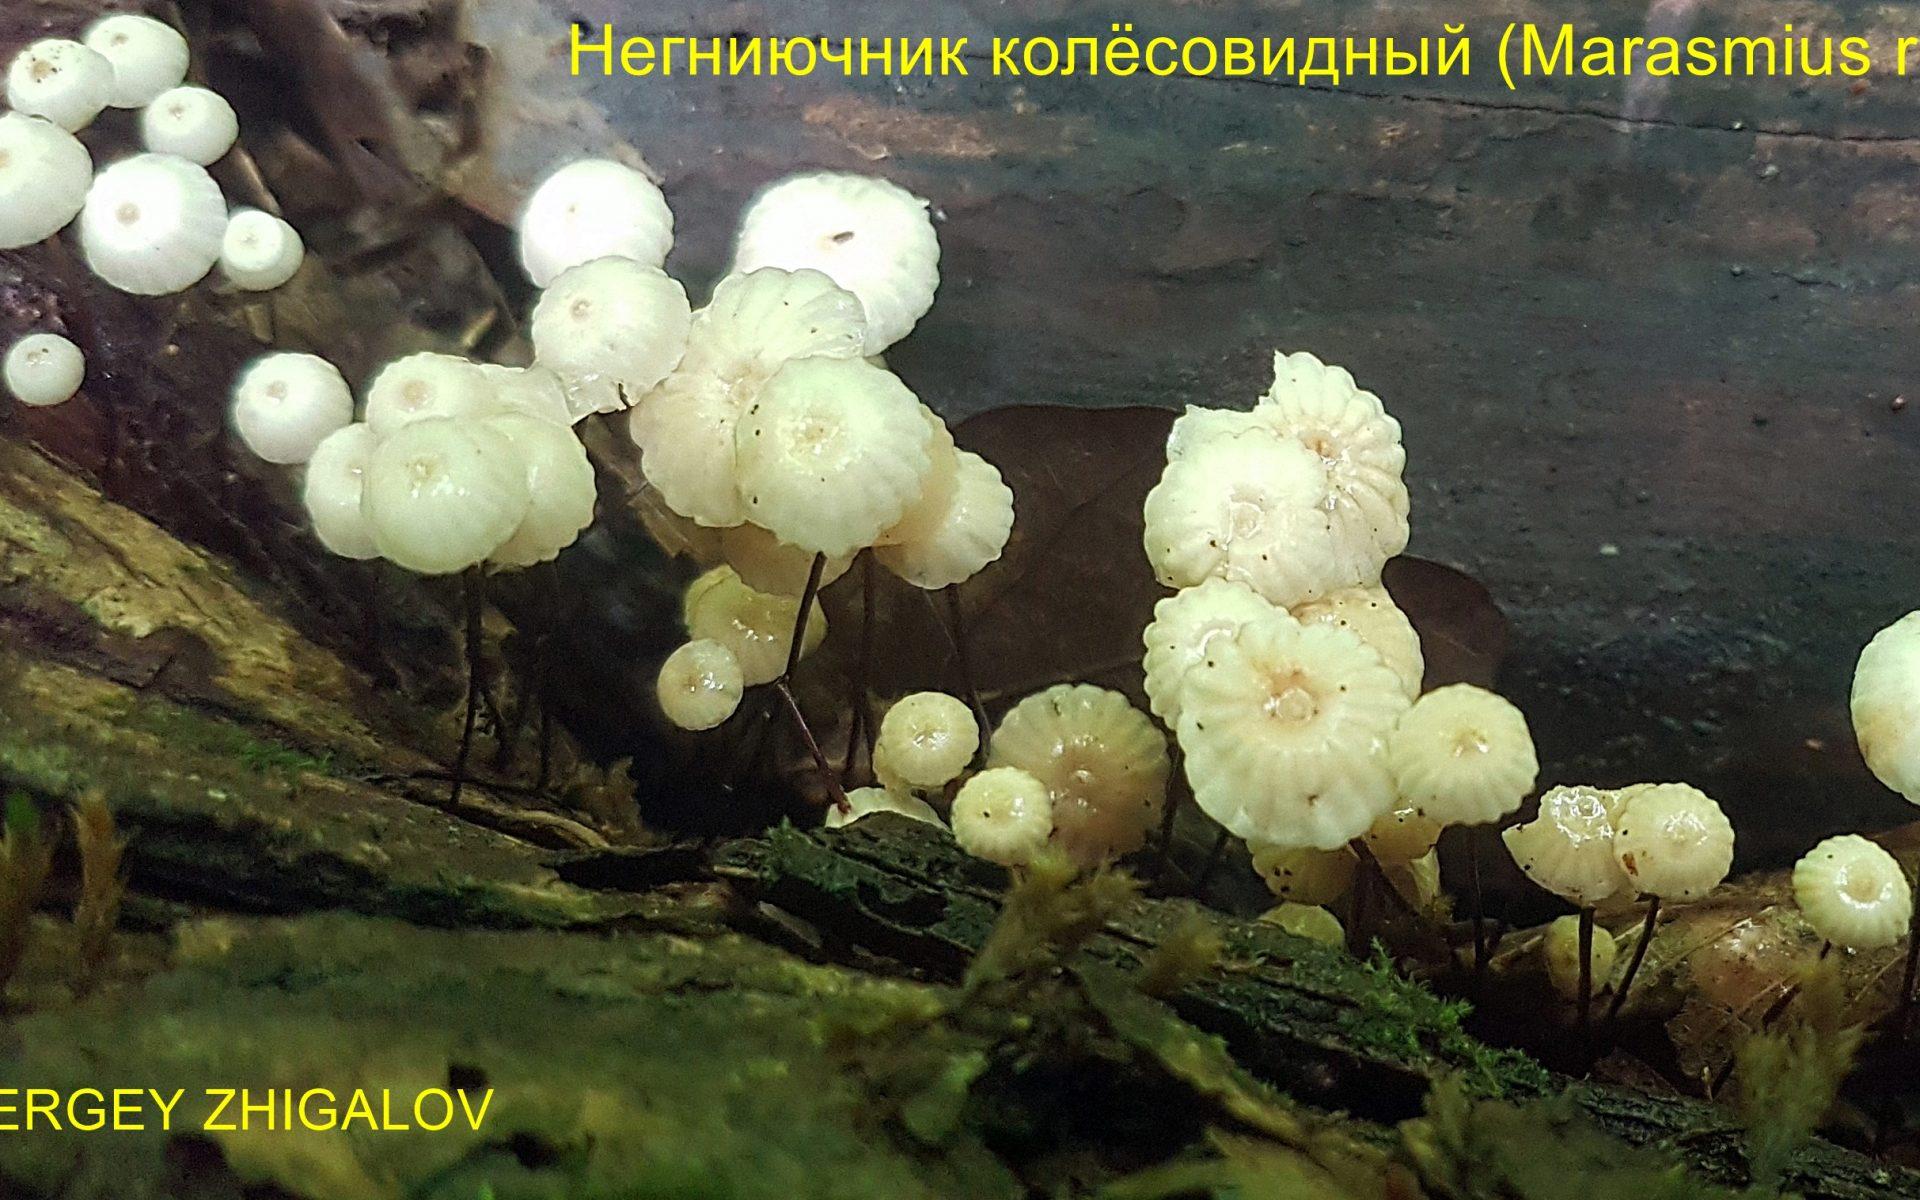 Негниючник колёсовидный Marasmius rotula